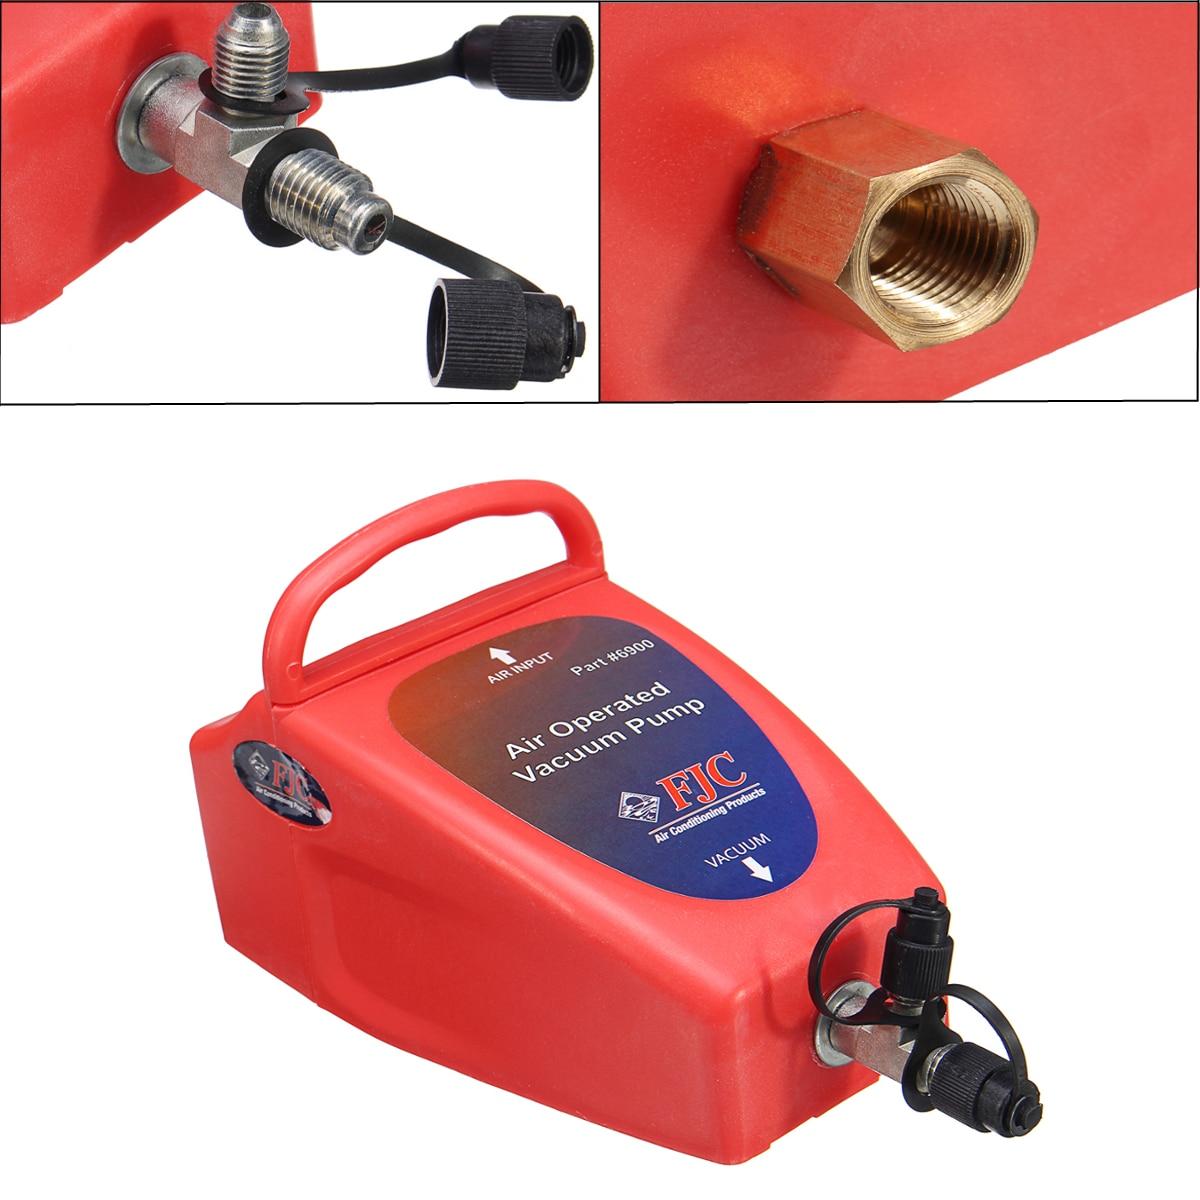 4.2CFM A/C Air Conditioning System Tool Air Operated Vacuum Pump Auto 1/2 ACME (R134a) & R12 Connector 80~150PSI Air Pressure 155 80 r12